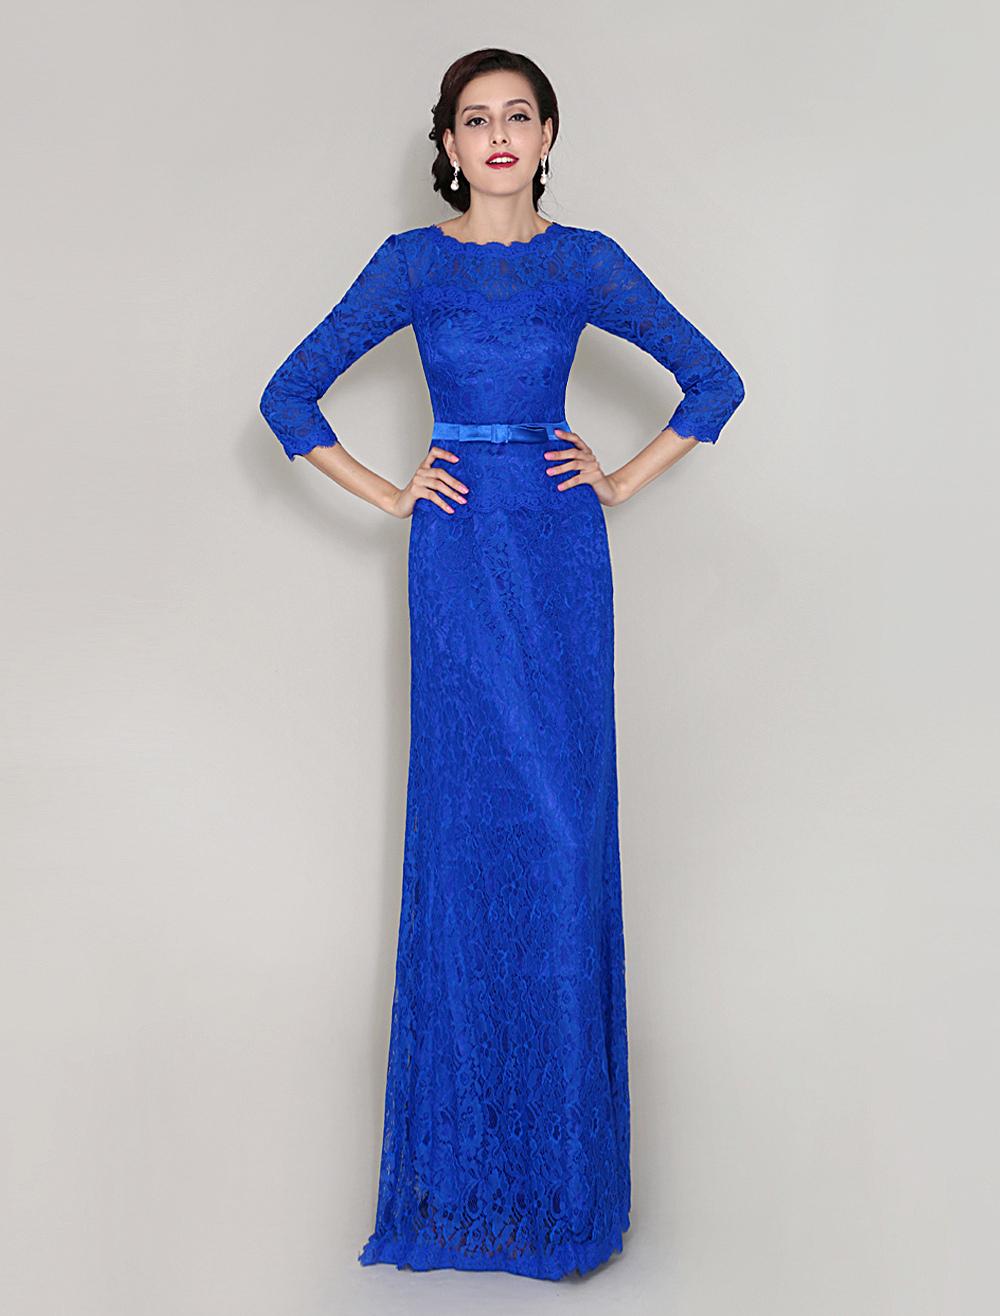 Elegant Jewel Neck Floor-Length Sleeves Lace Dress With Lovely Bowknot Belt